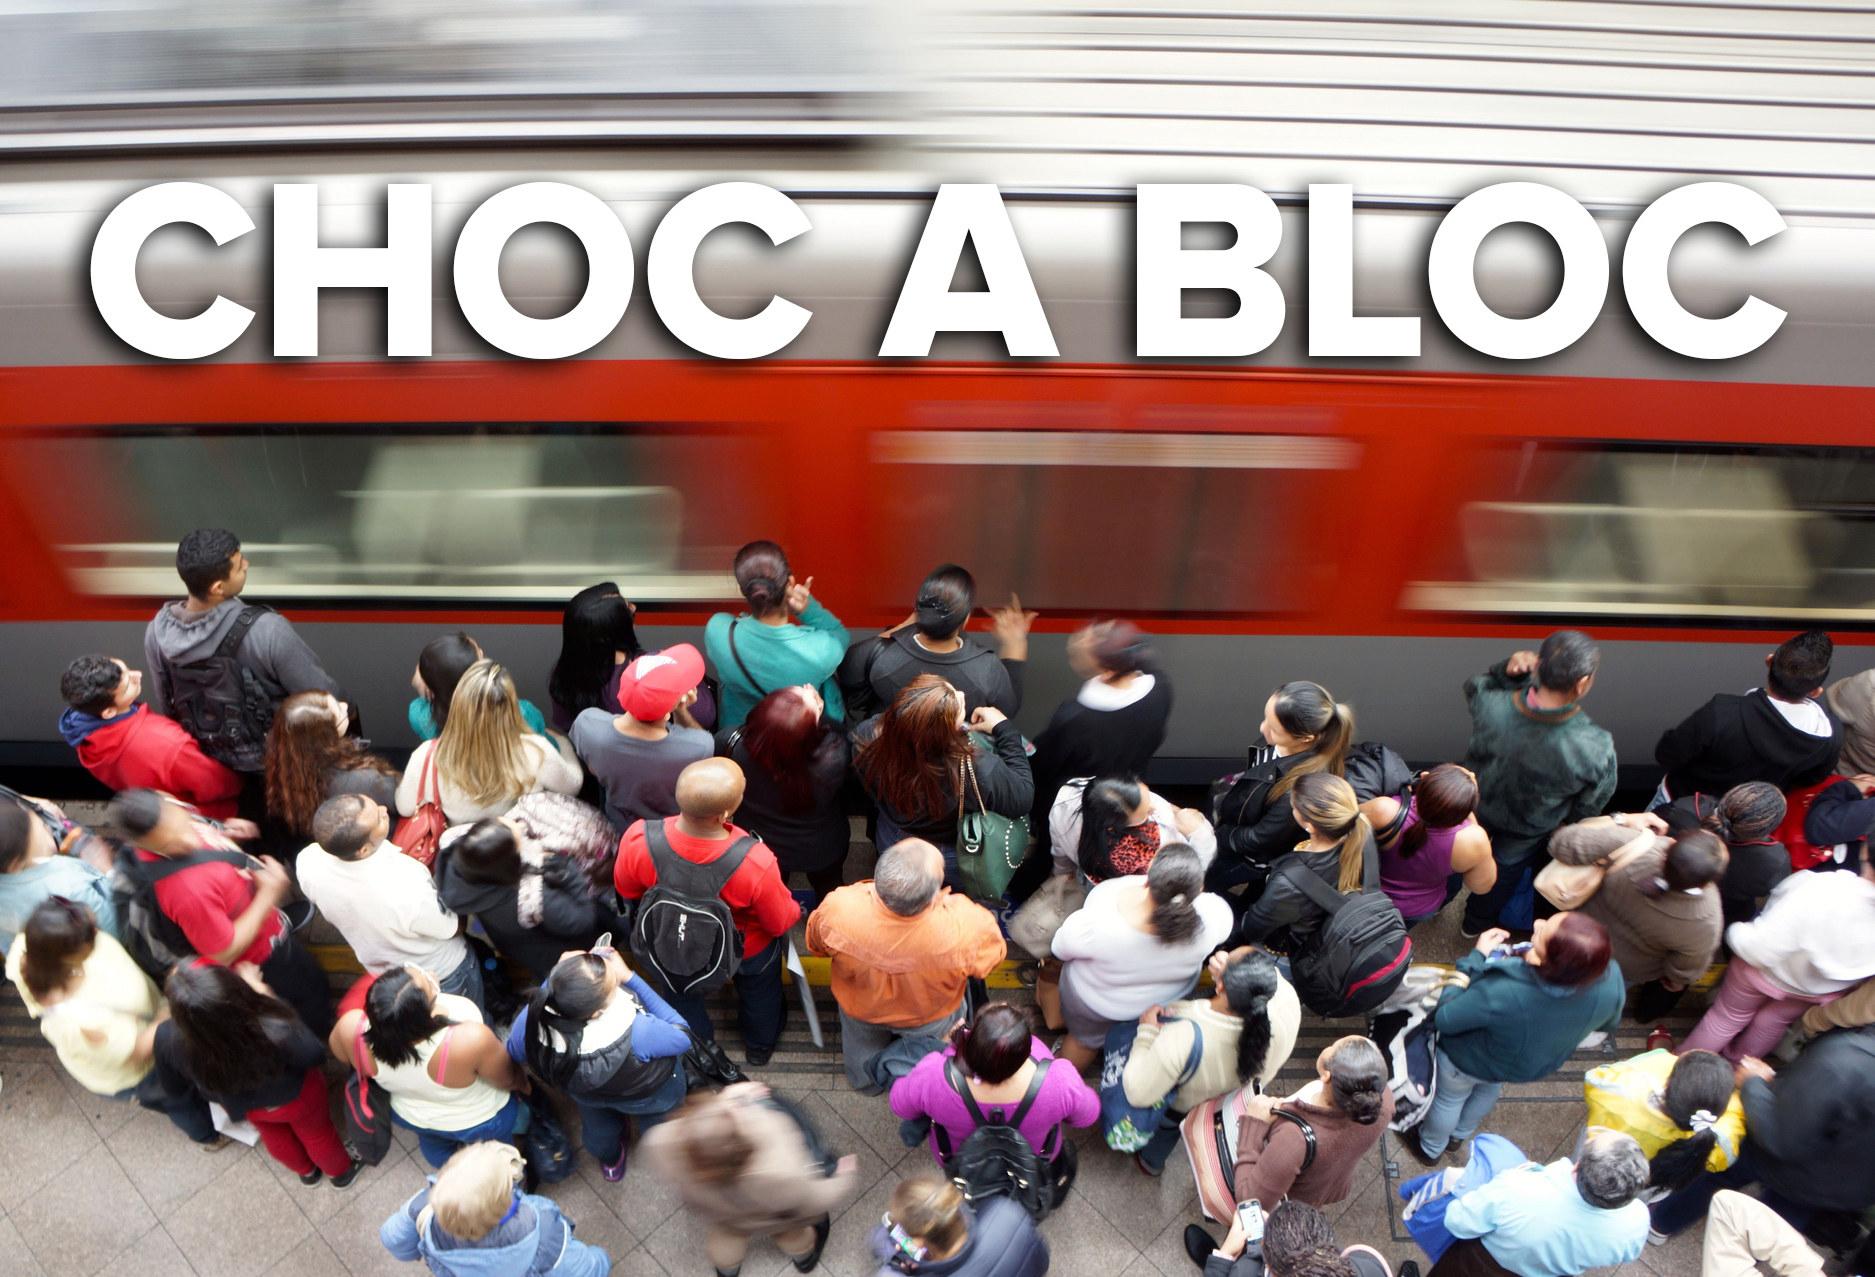 A crowded train station platform